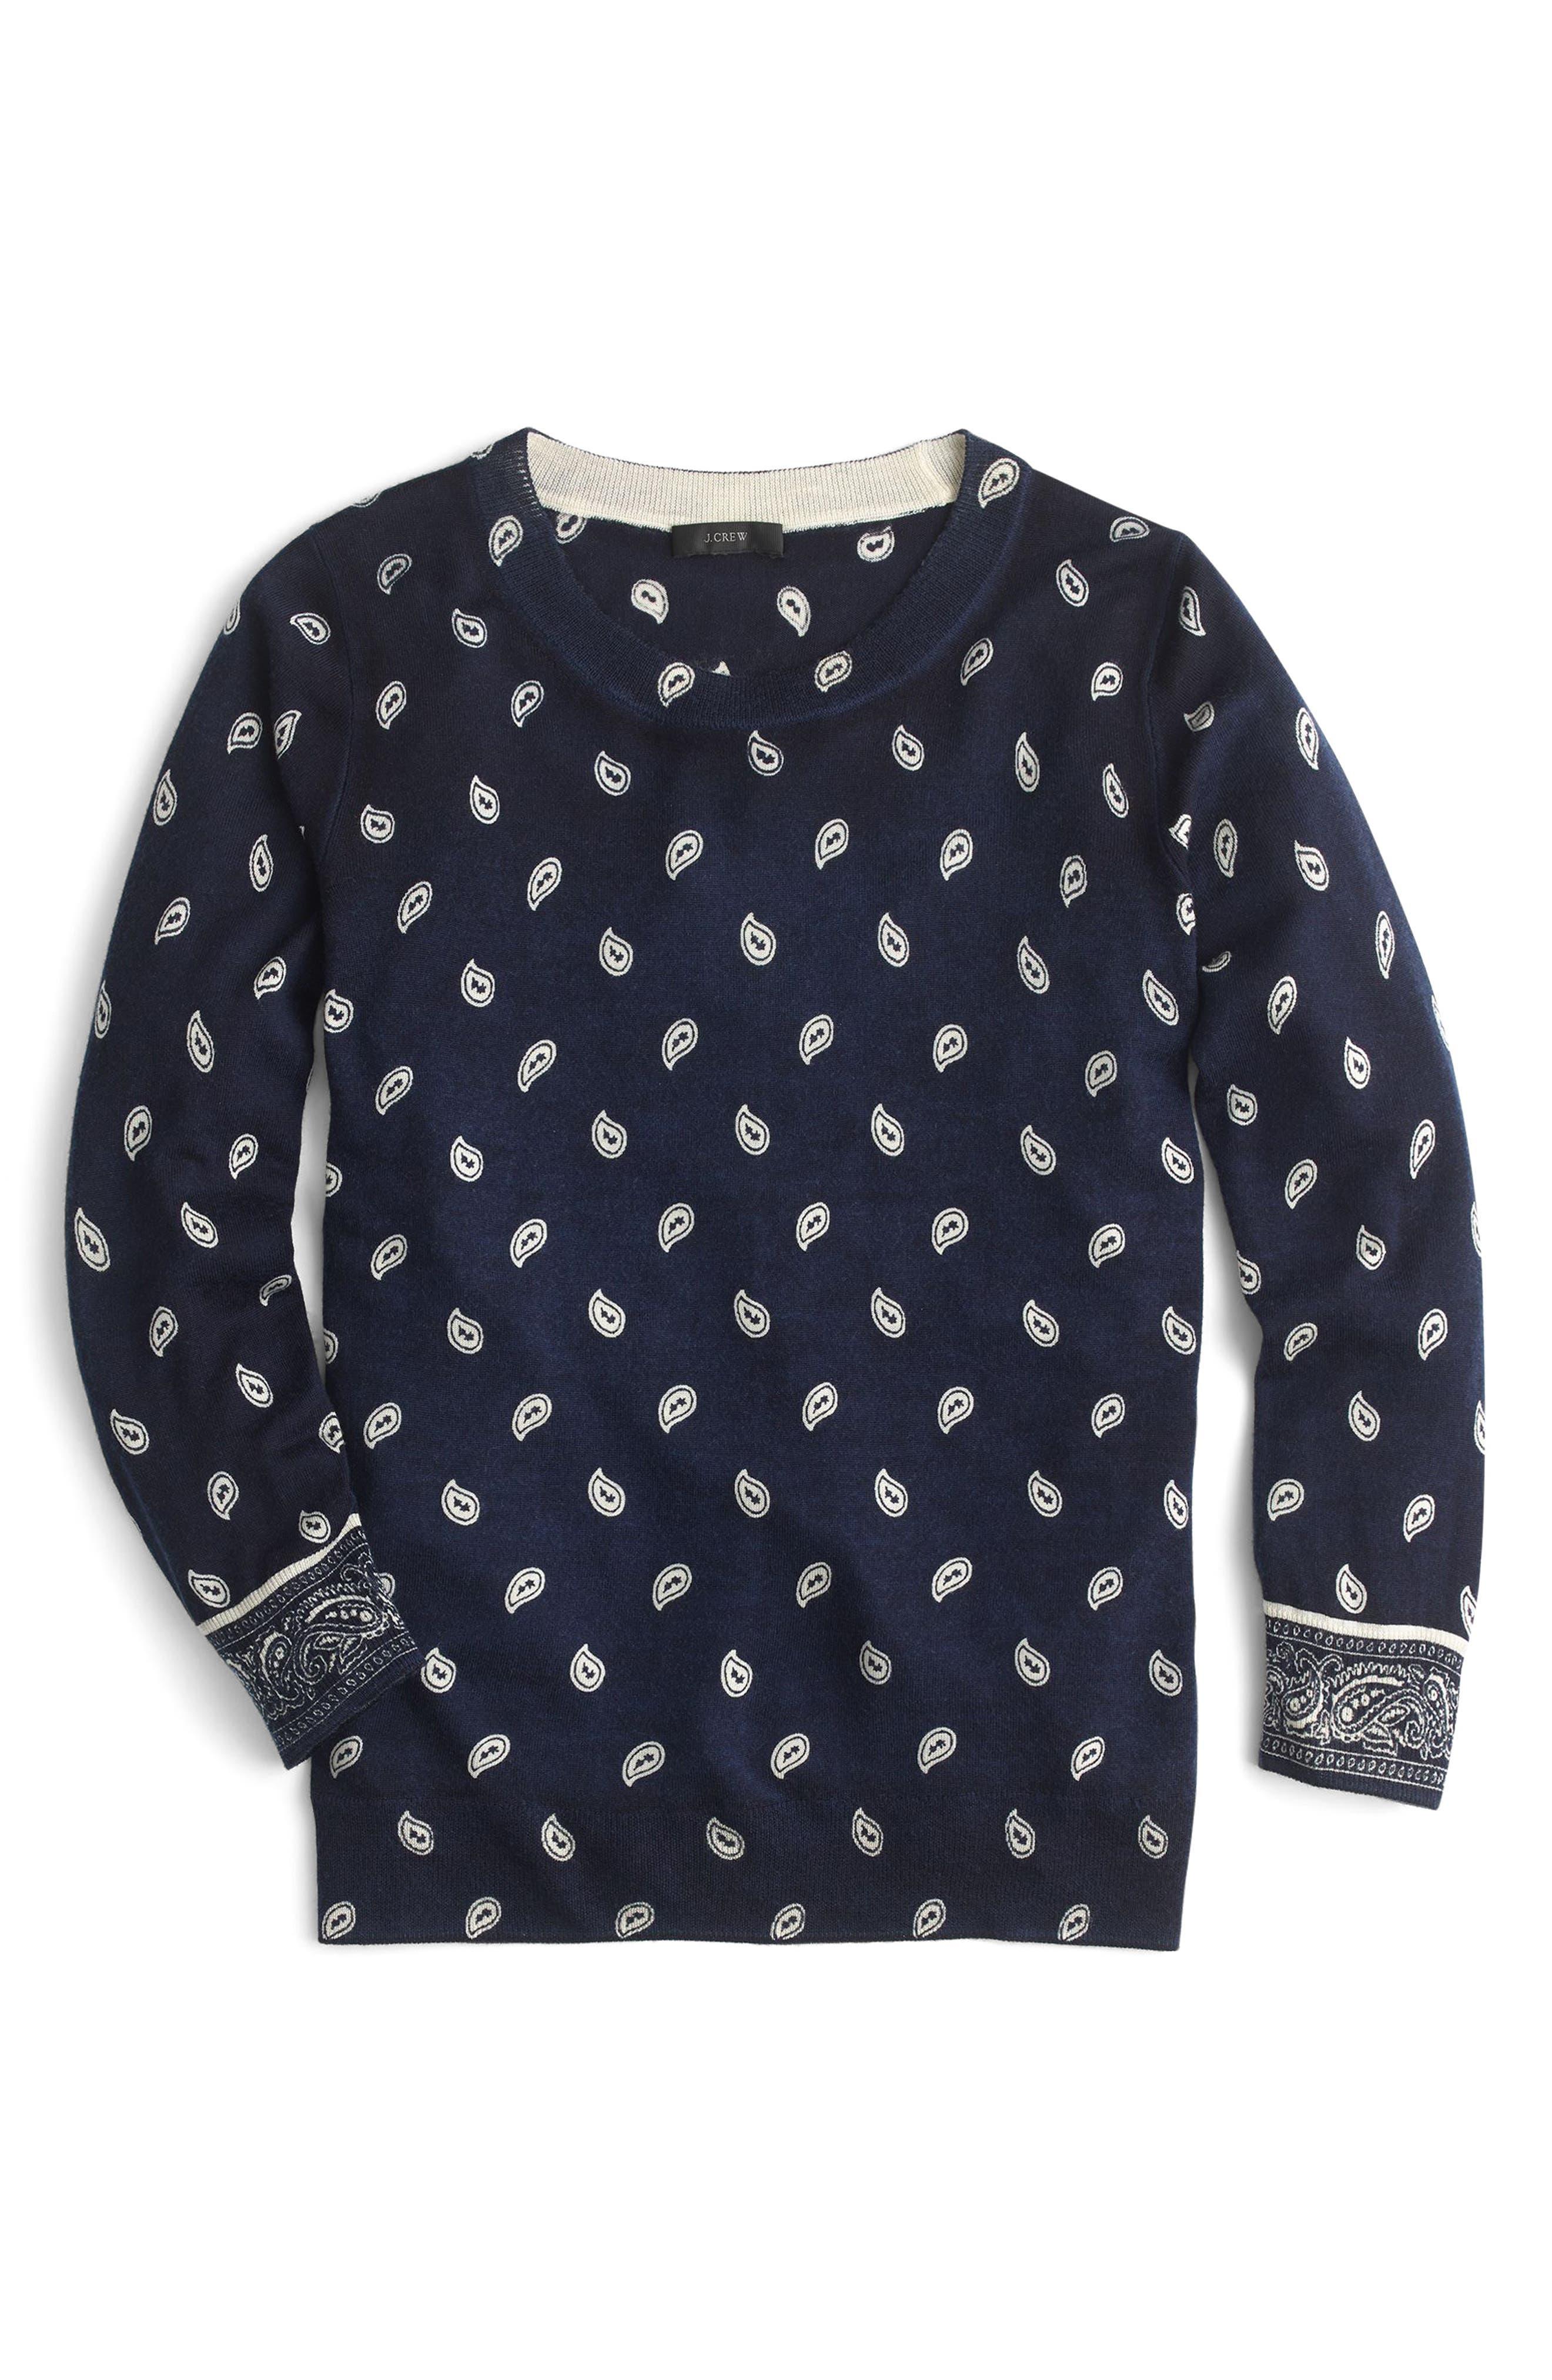 J.Crew Bandana Print Tippi Sweater,                             Alternate thumbnail 2, color,                             Navy Ivory